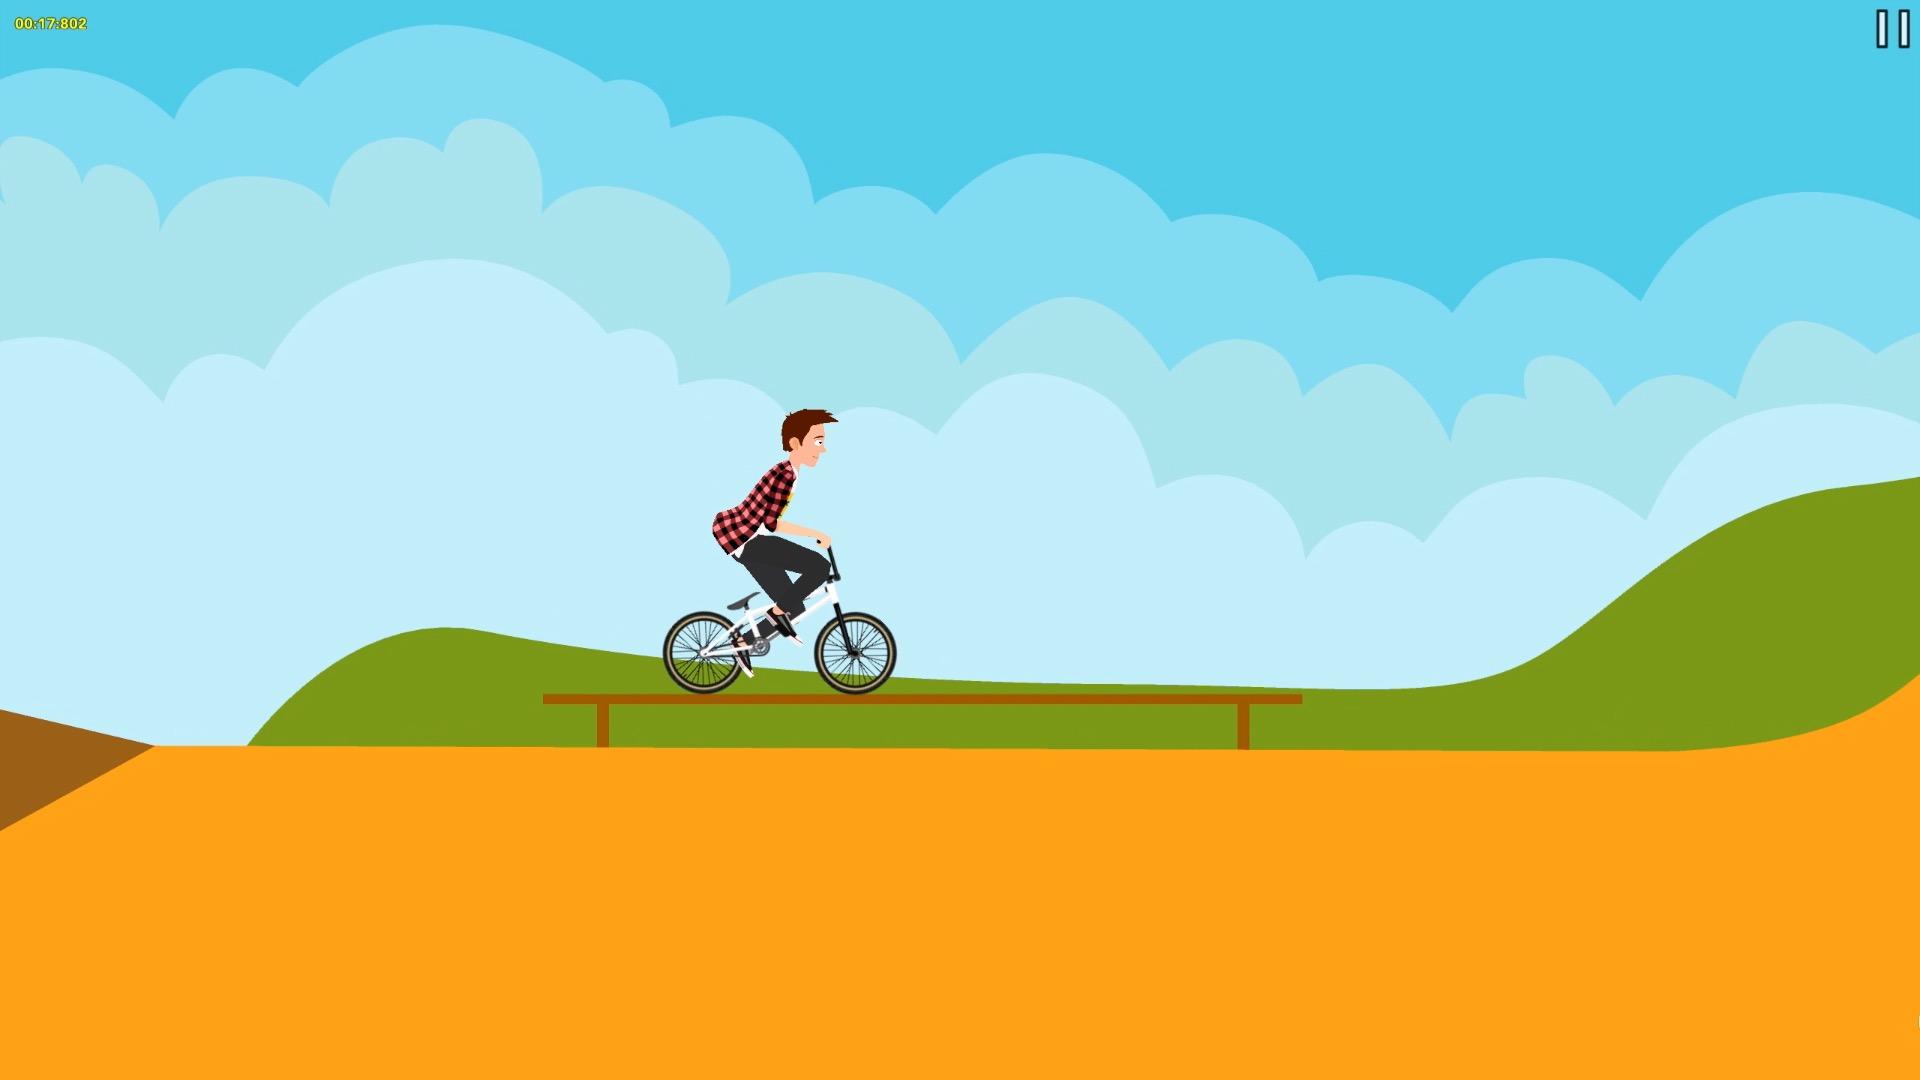 Image 2 Draw Rider 2 Indie Db